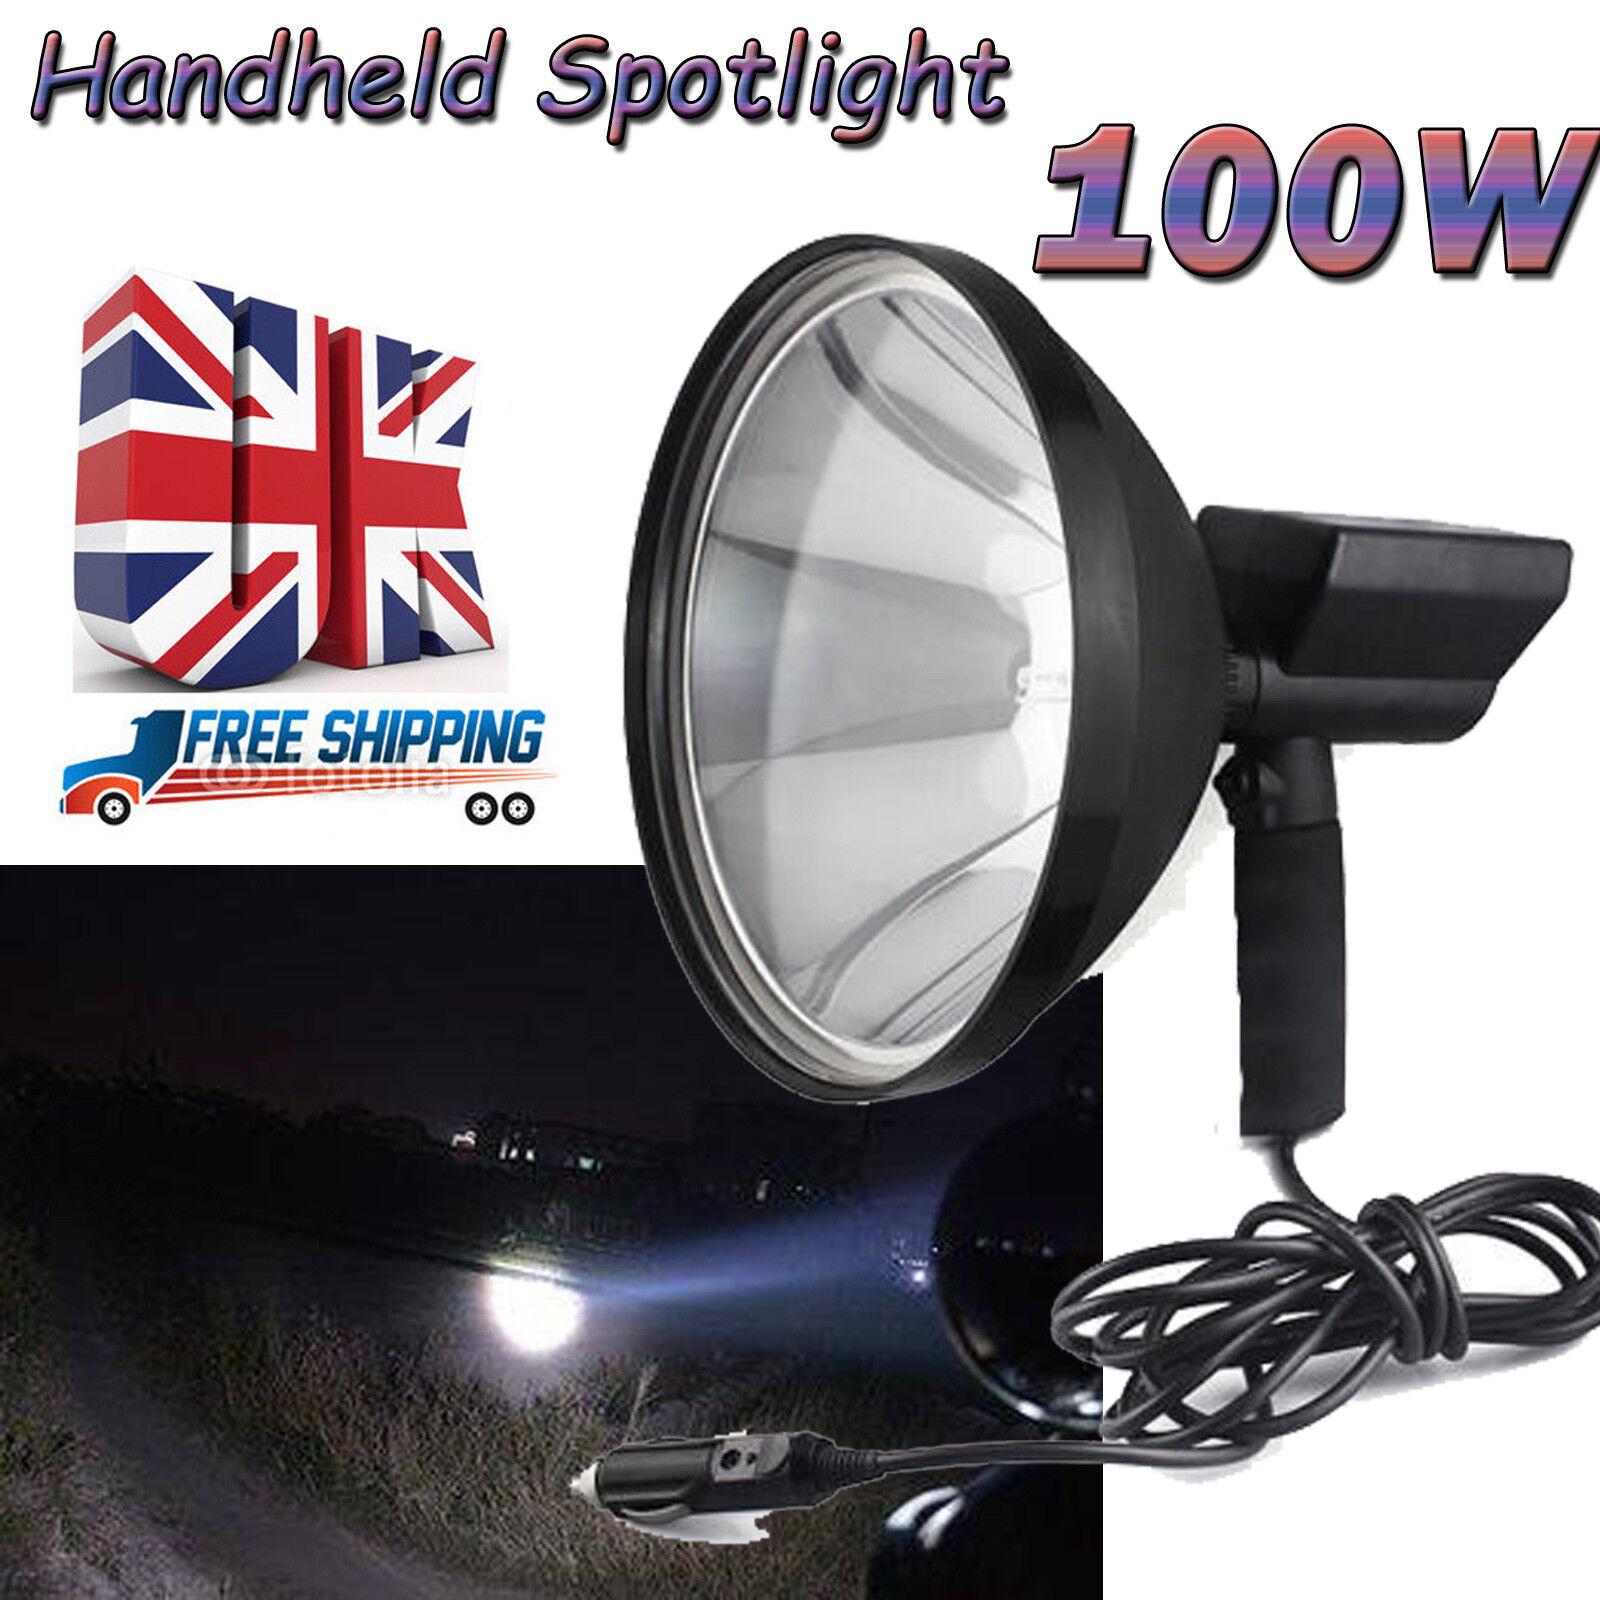 100W Spotlight Camping Handheld Hunting Spot Light HID Lamp Foxing Shooting 12V